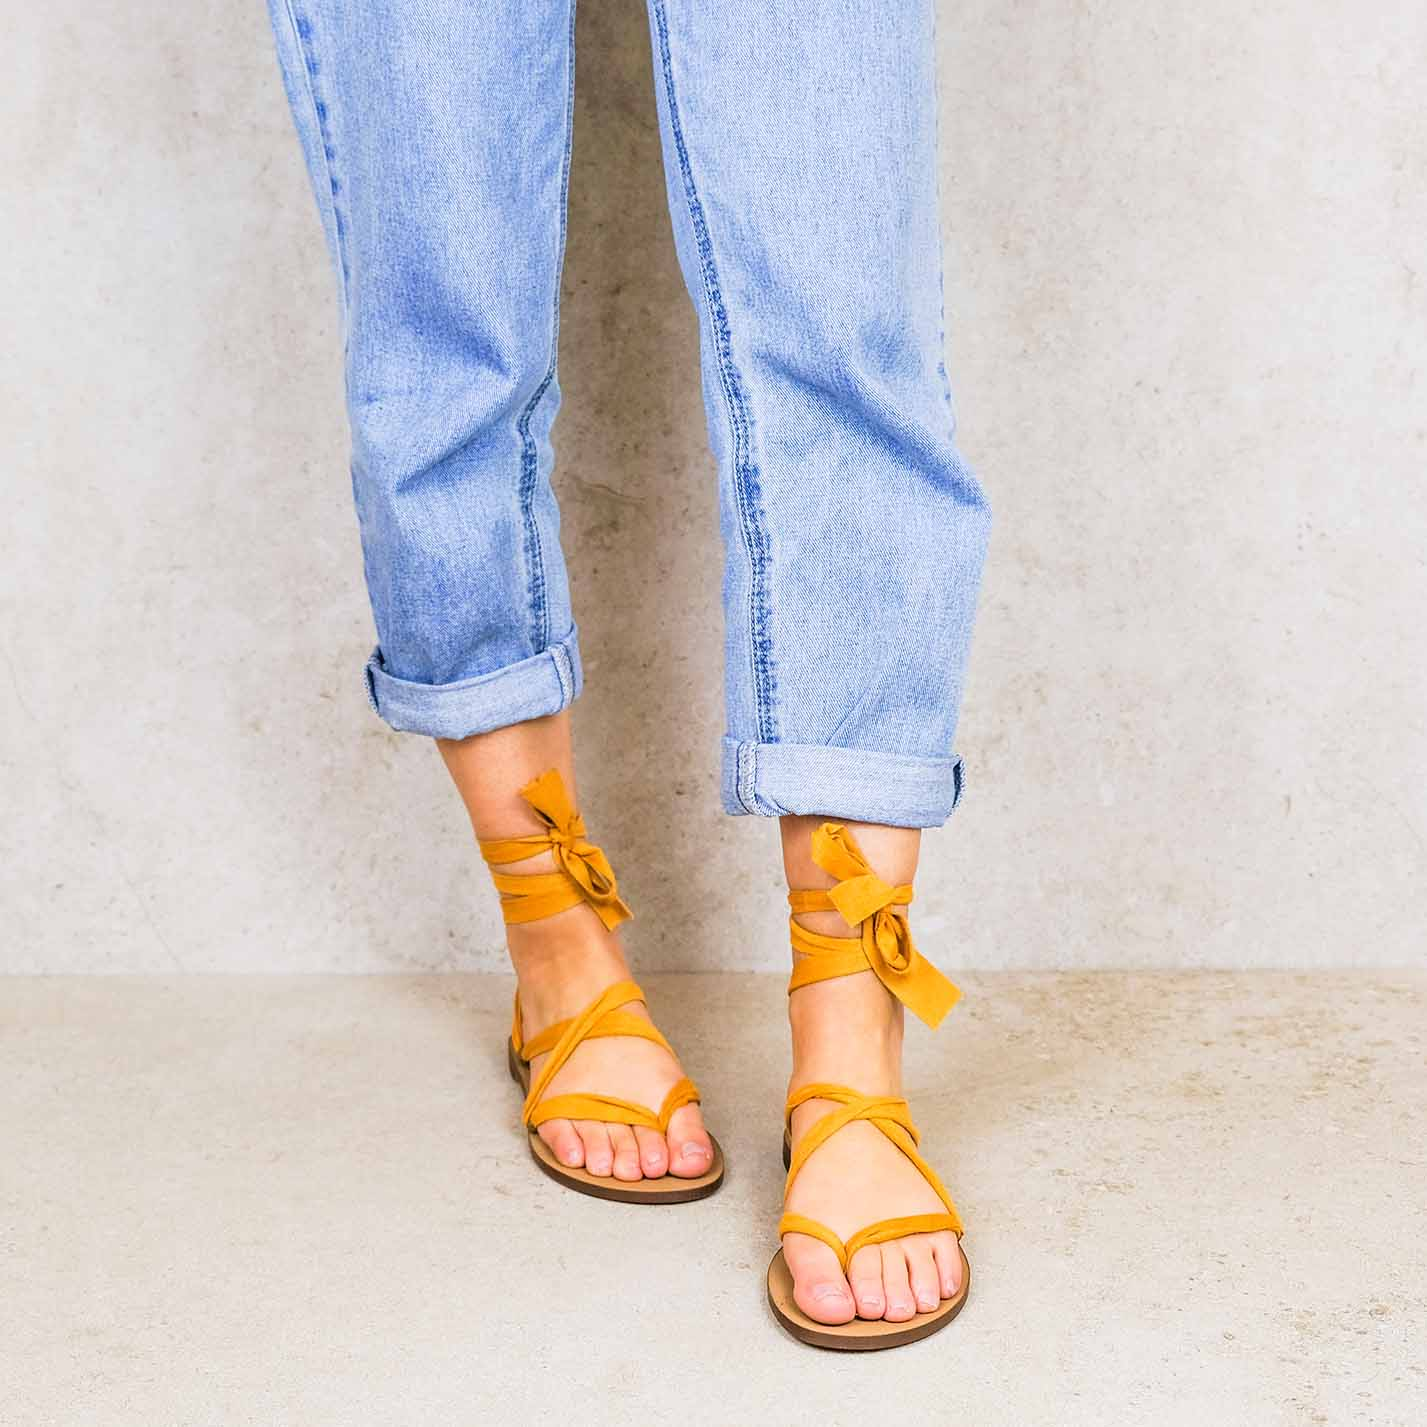 Tuscan-sun_suede ribbons linten lintsandalen sandals travelsandals vegan sustainable sandals wikkelsandalen